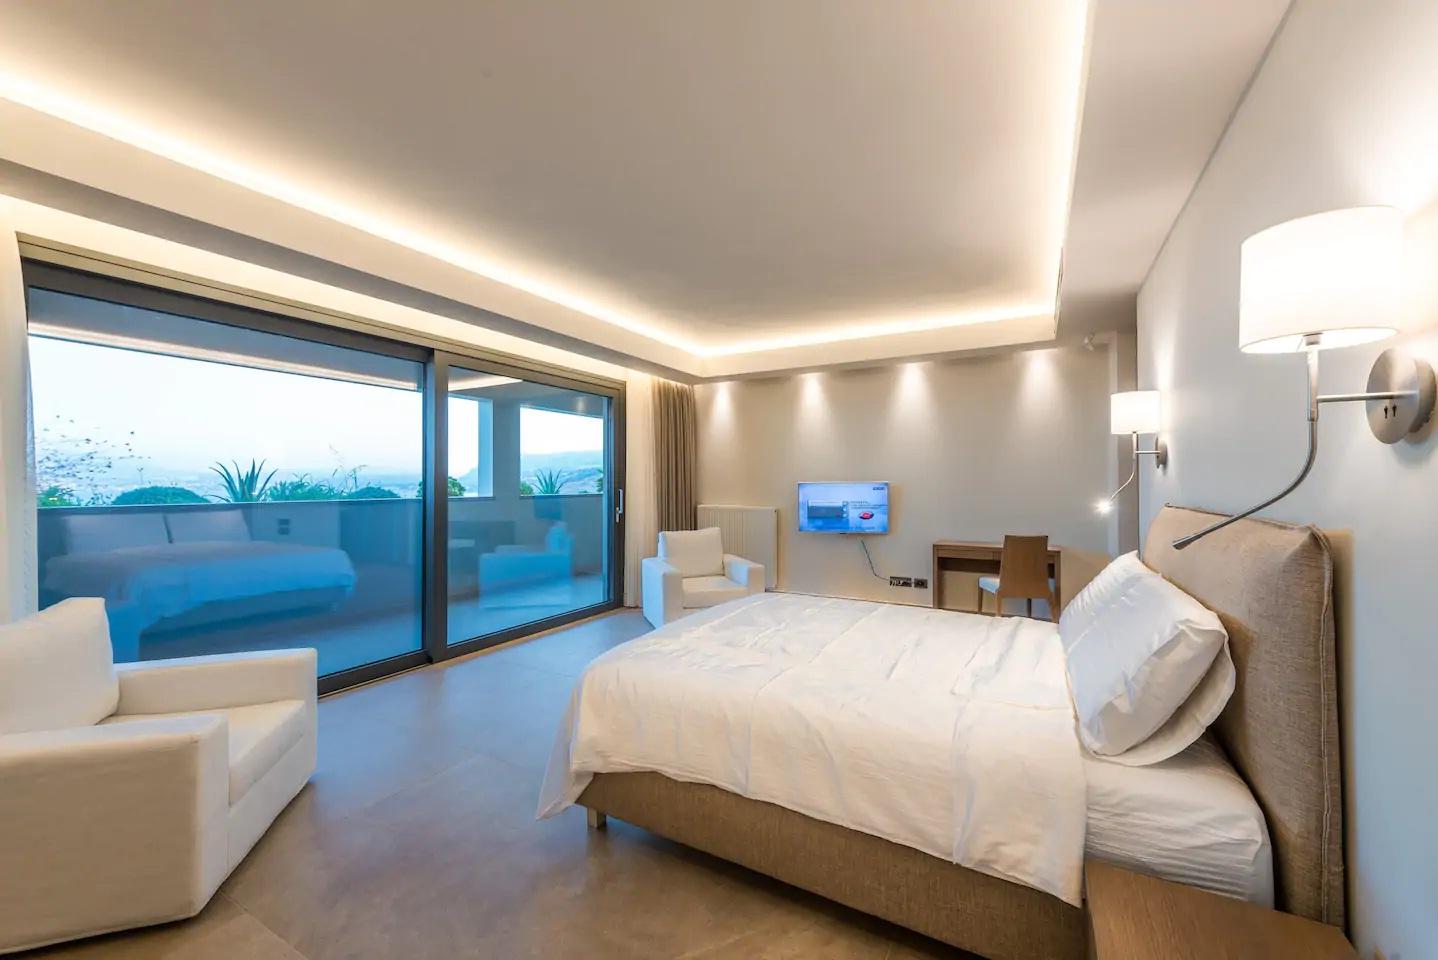 Villa With six bedroom